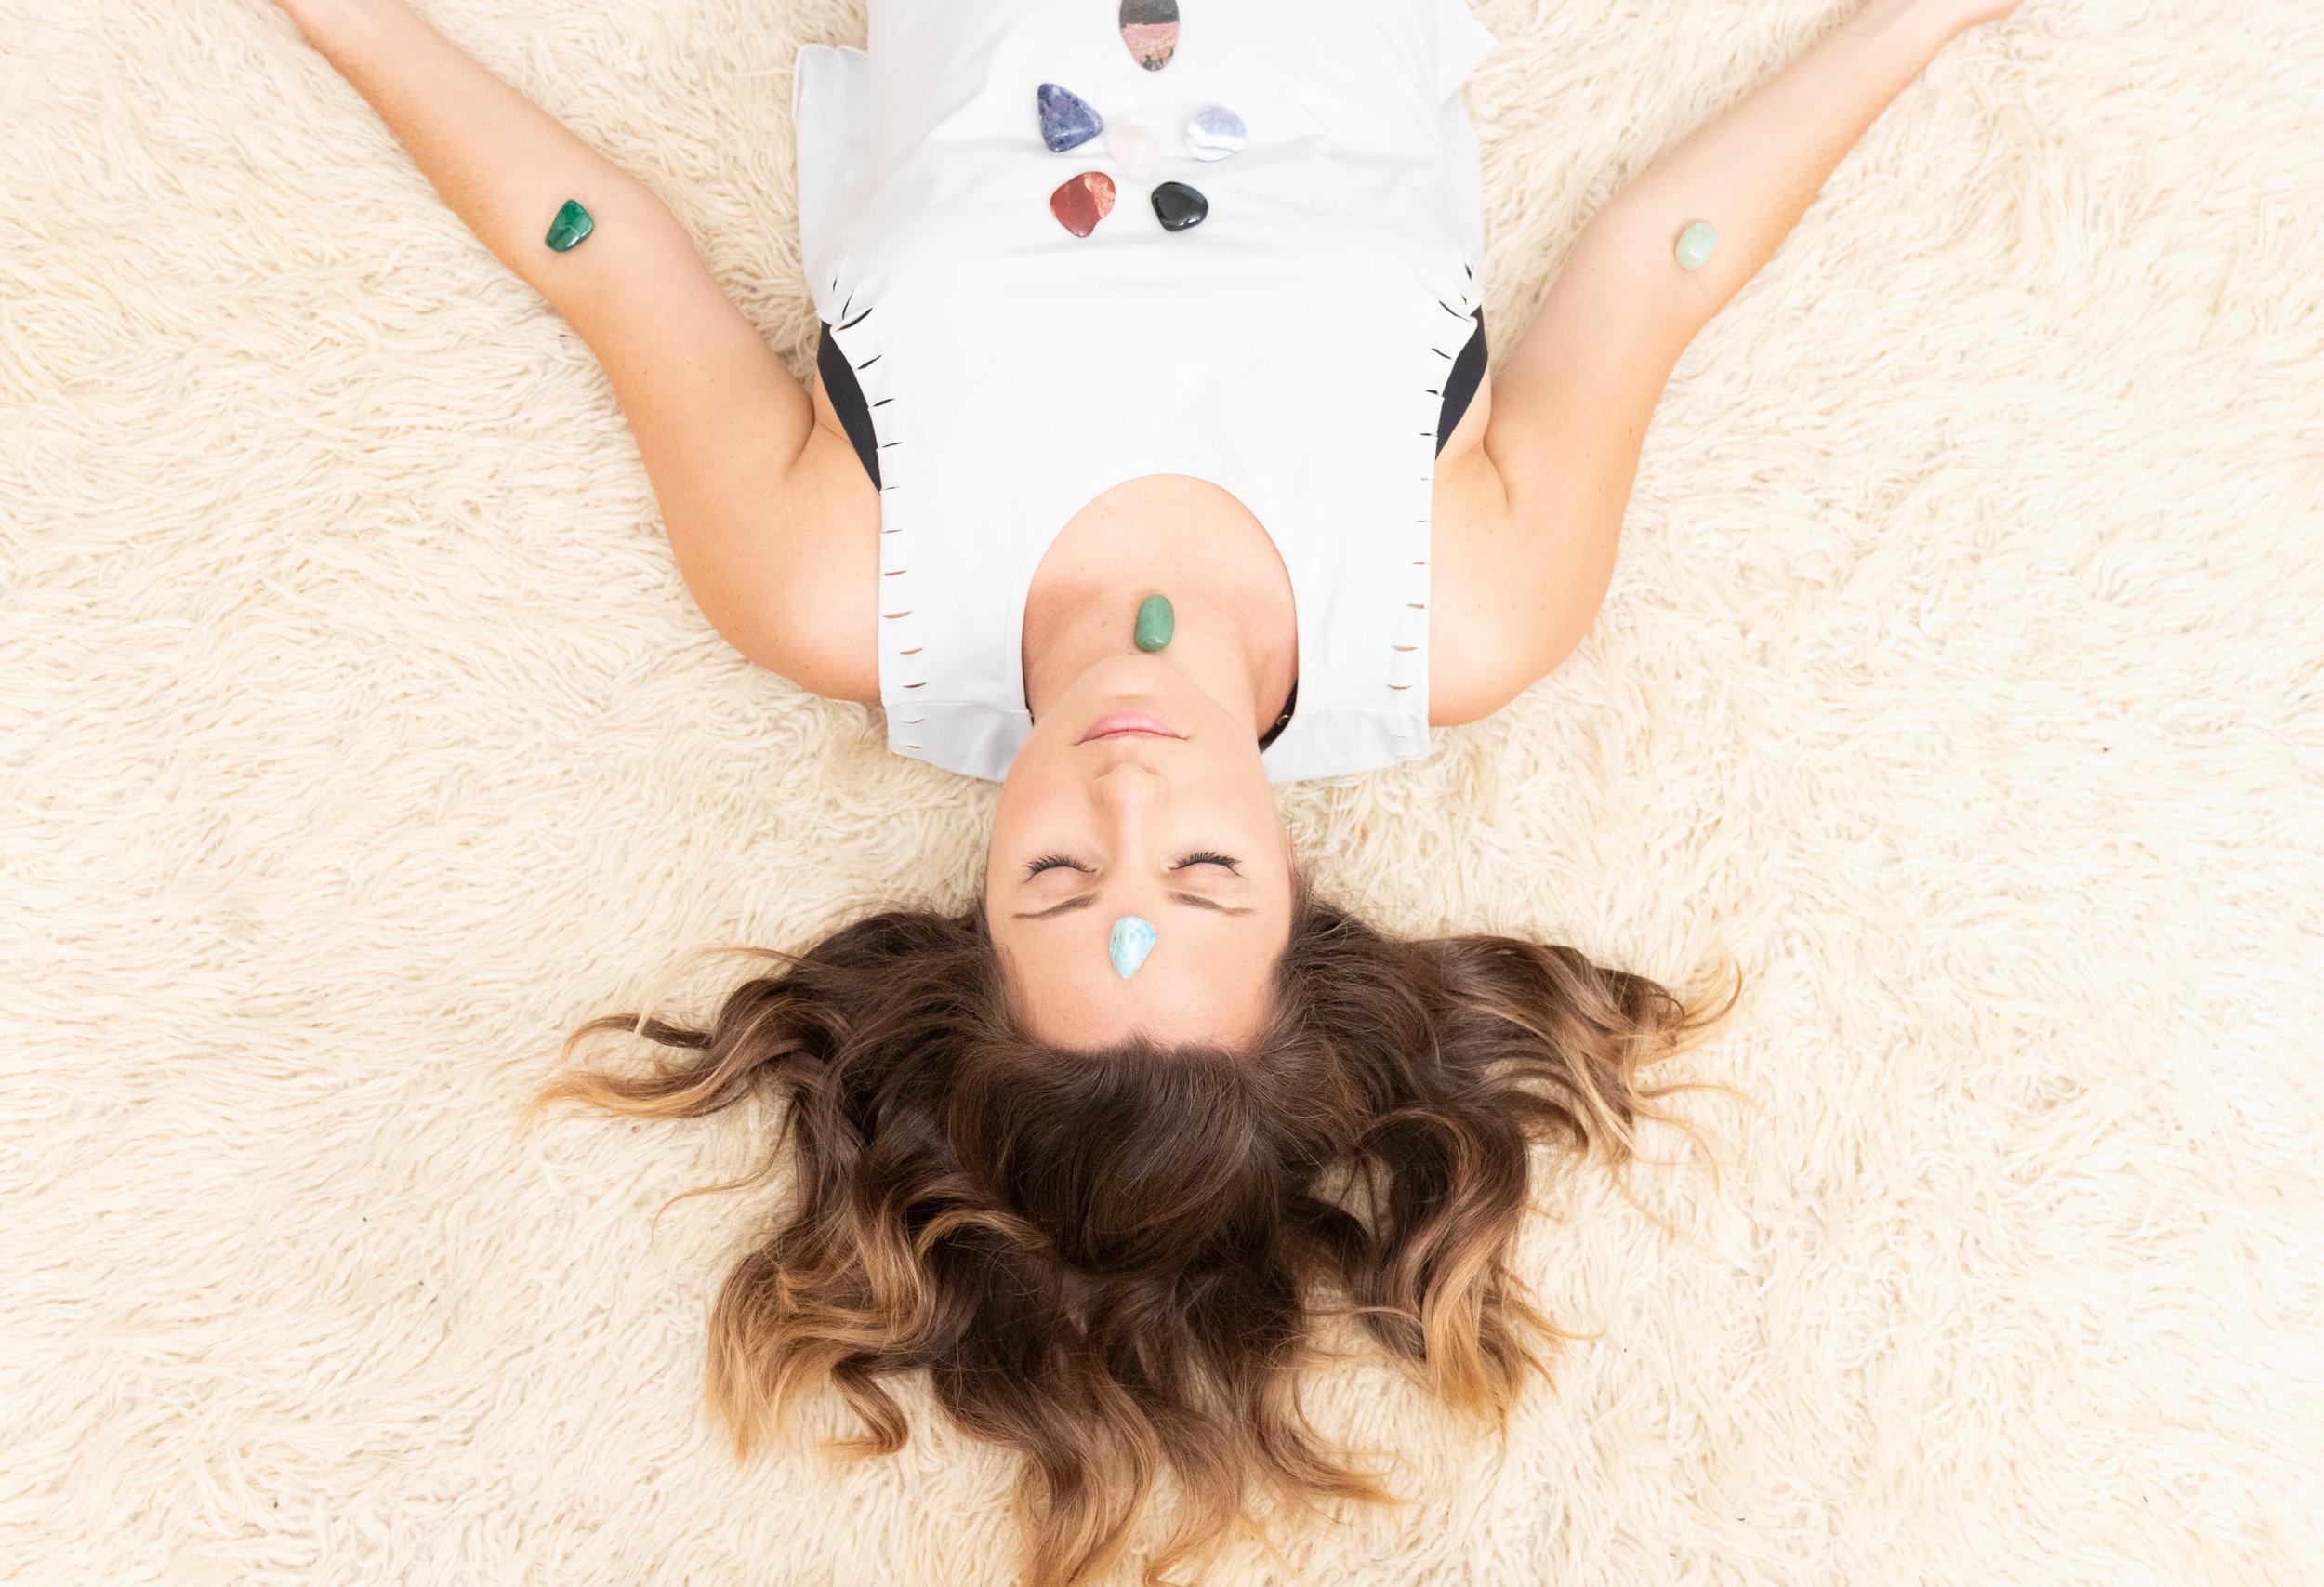 Professional lifestyle portrait of Natasha Wellness health coach ayurveda and chakra stones photographed by Vision Balm in Charleston, SC.